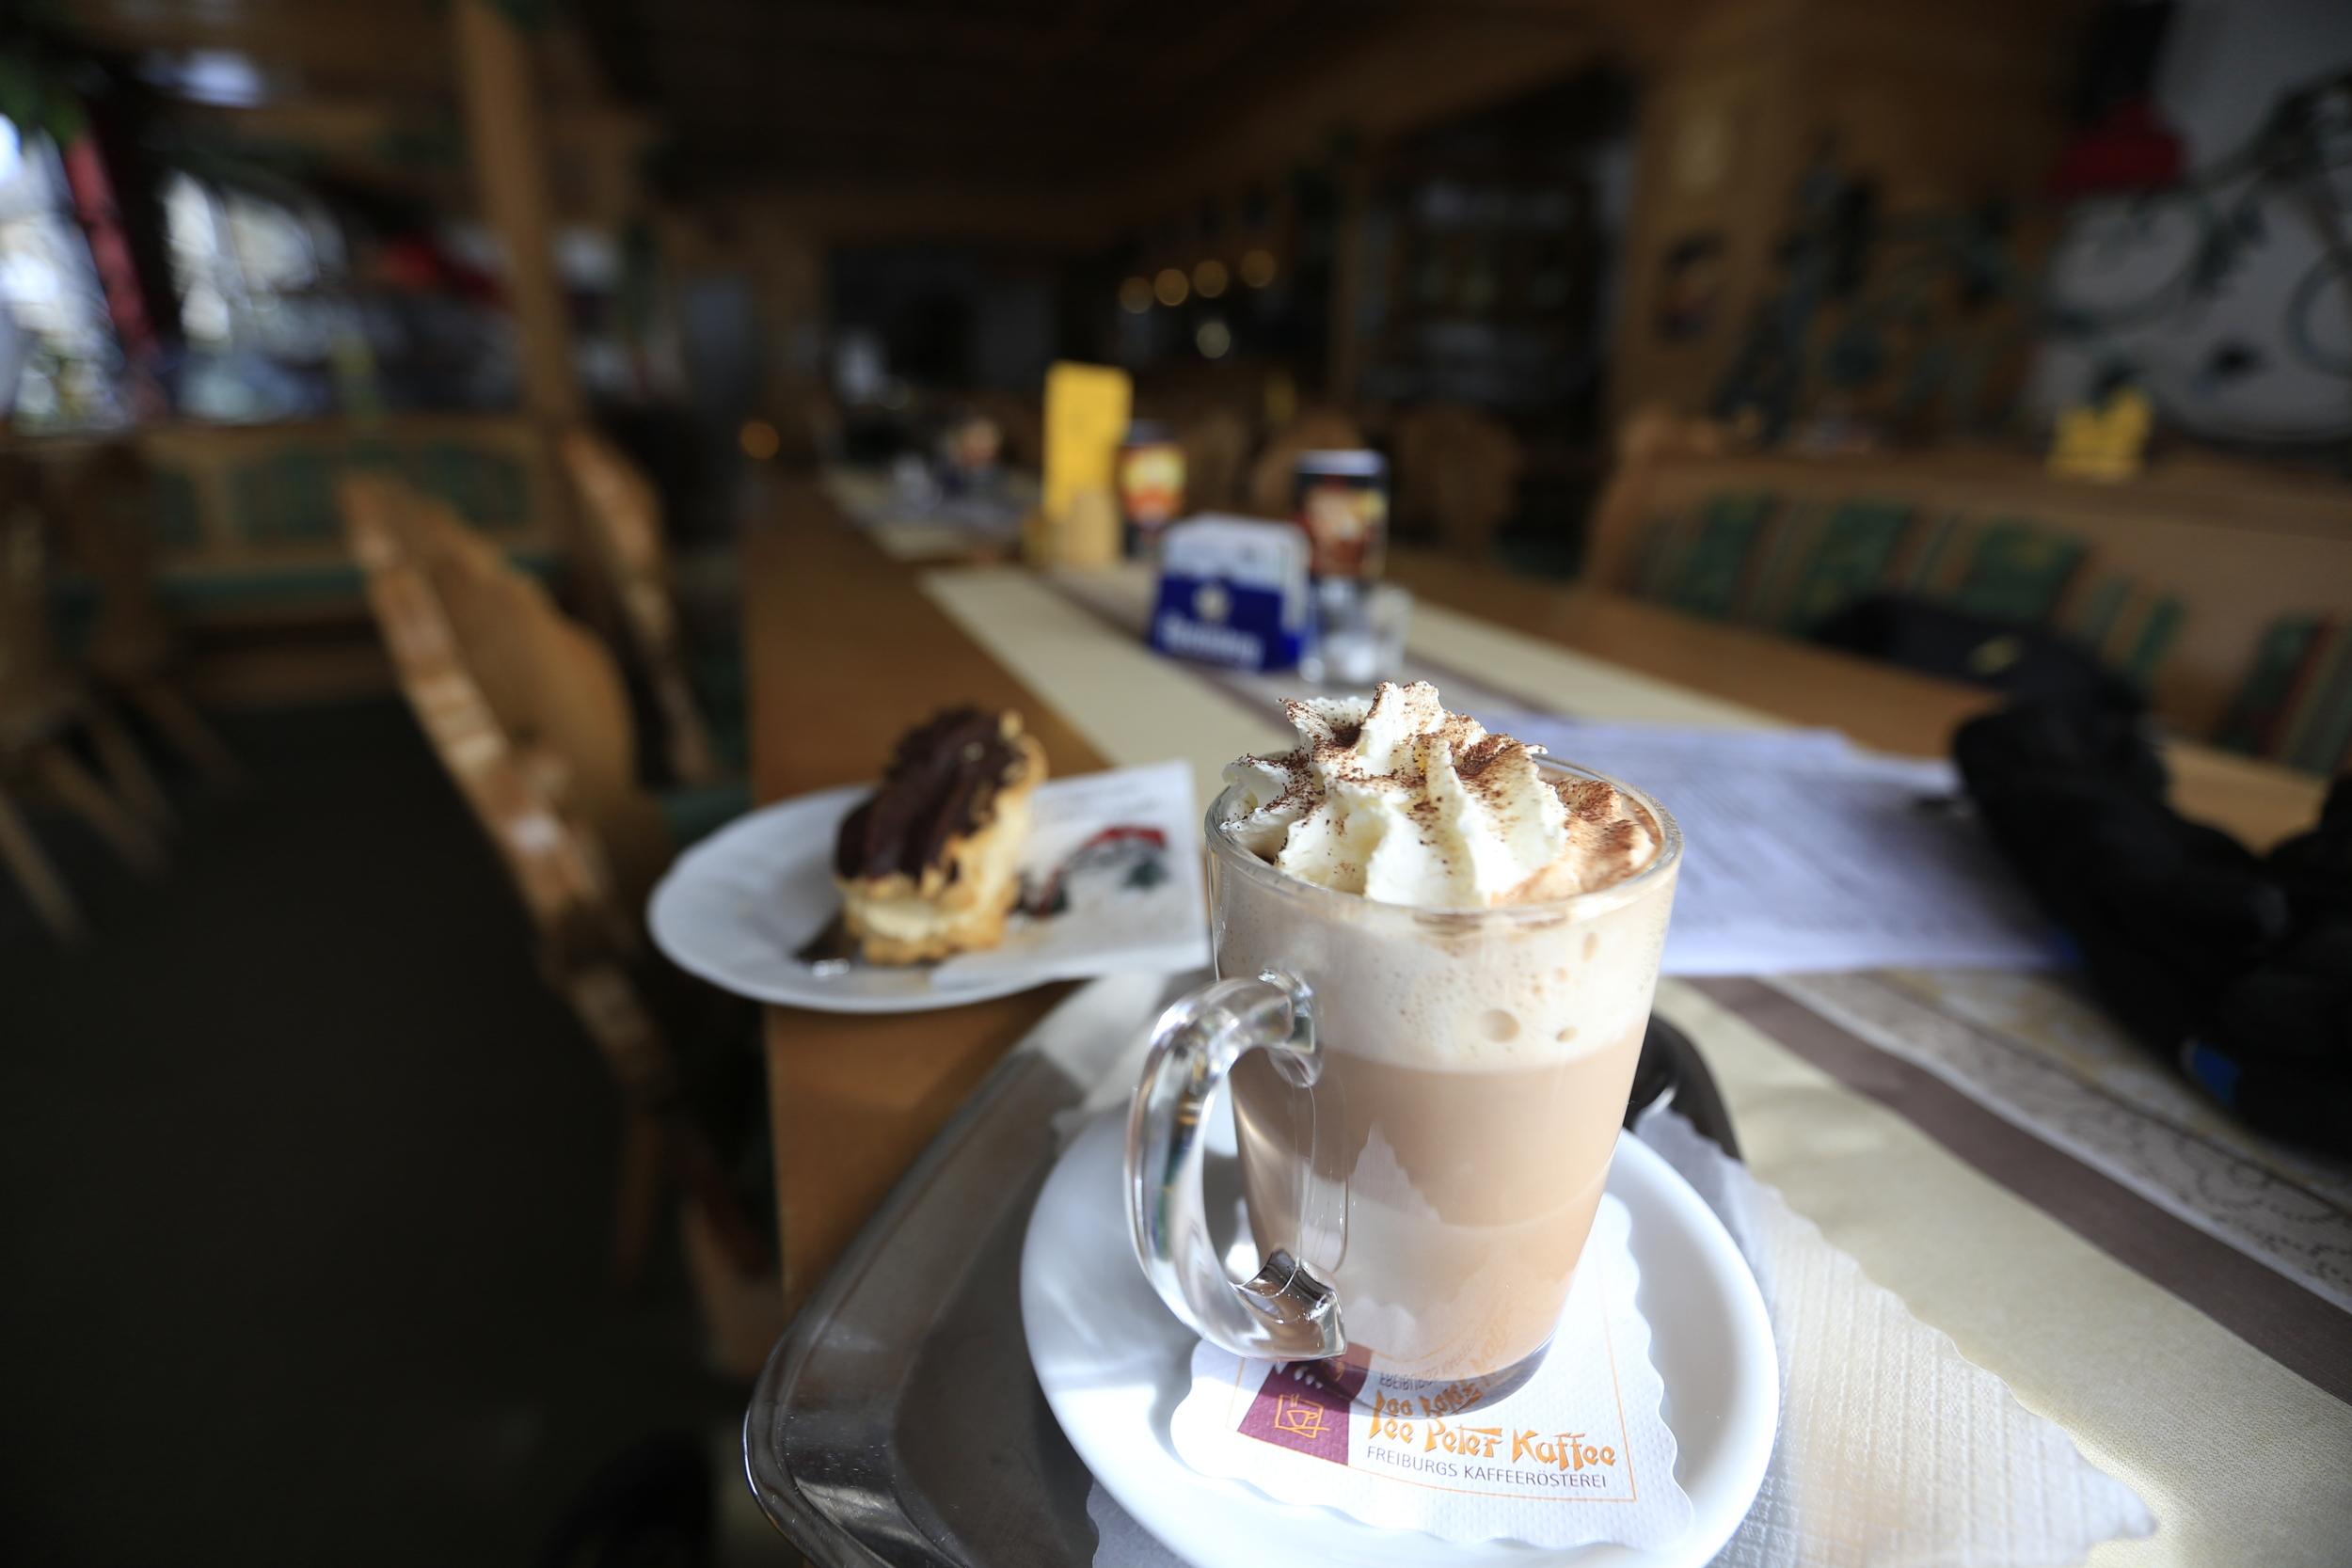 Hot Chocolate and cake....